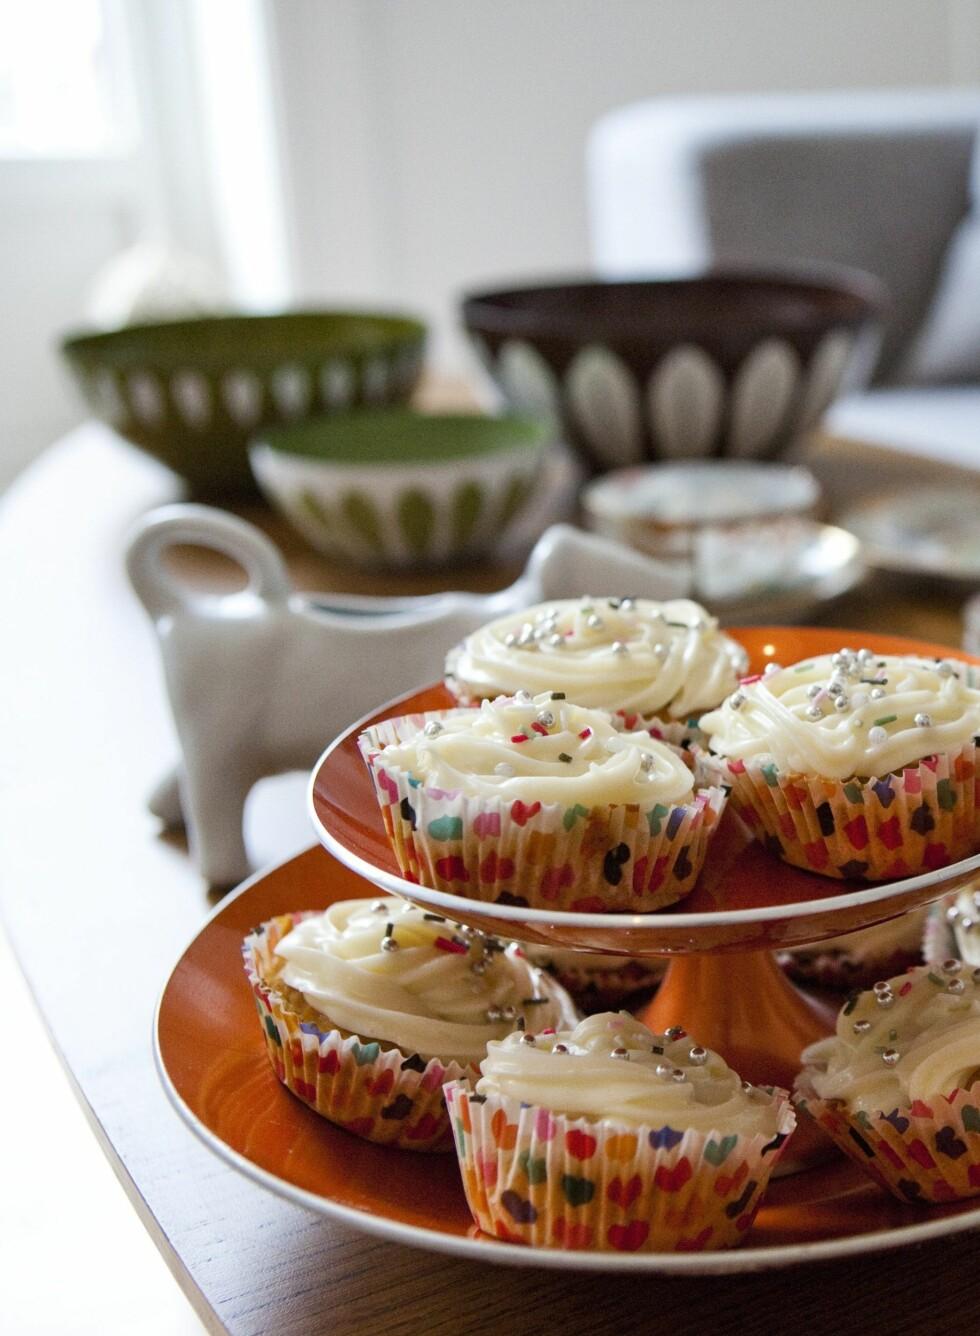 Også serveringen var helt 50-talls. Guro hadde bakt fargerike muffins til vi kom på besøk. Foto: Per Ervland